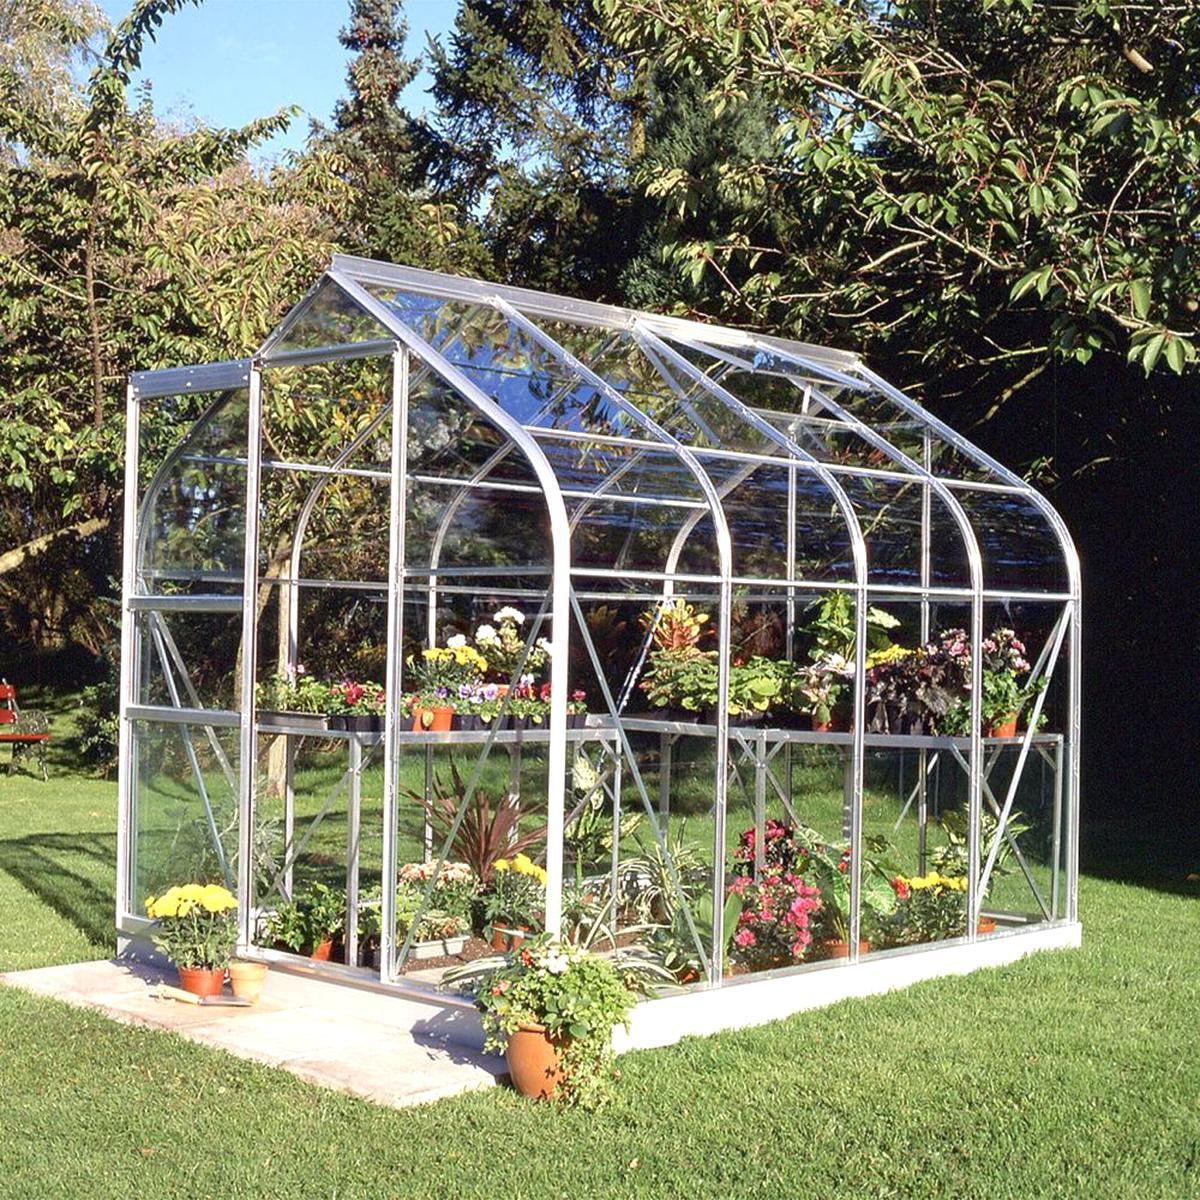 Serre Horticole Verre D'Occasion concernant Serre De Jardin Ancienne Occasion